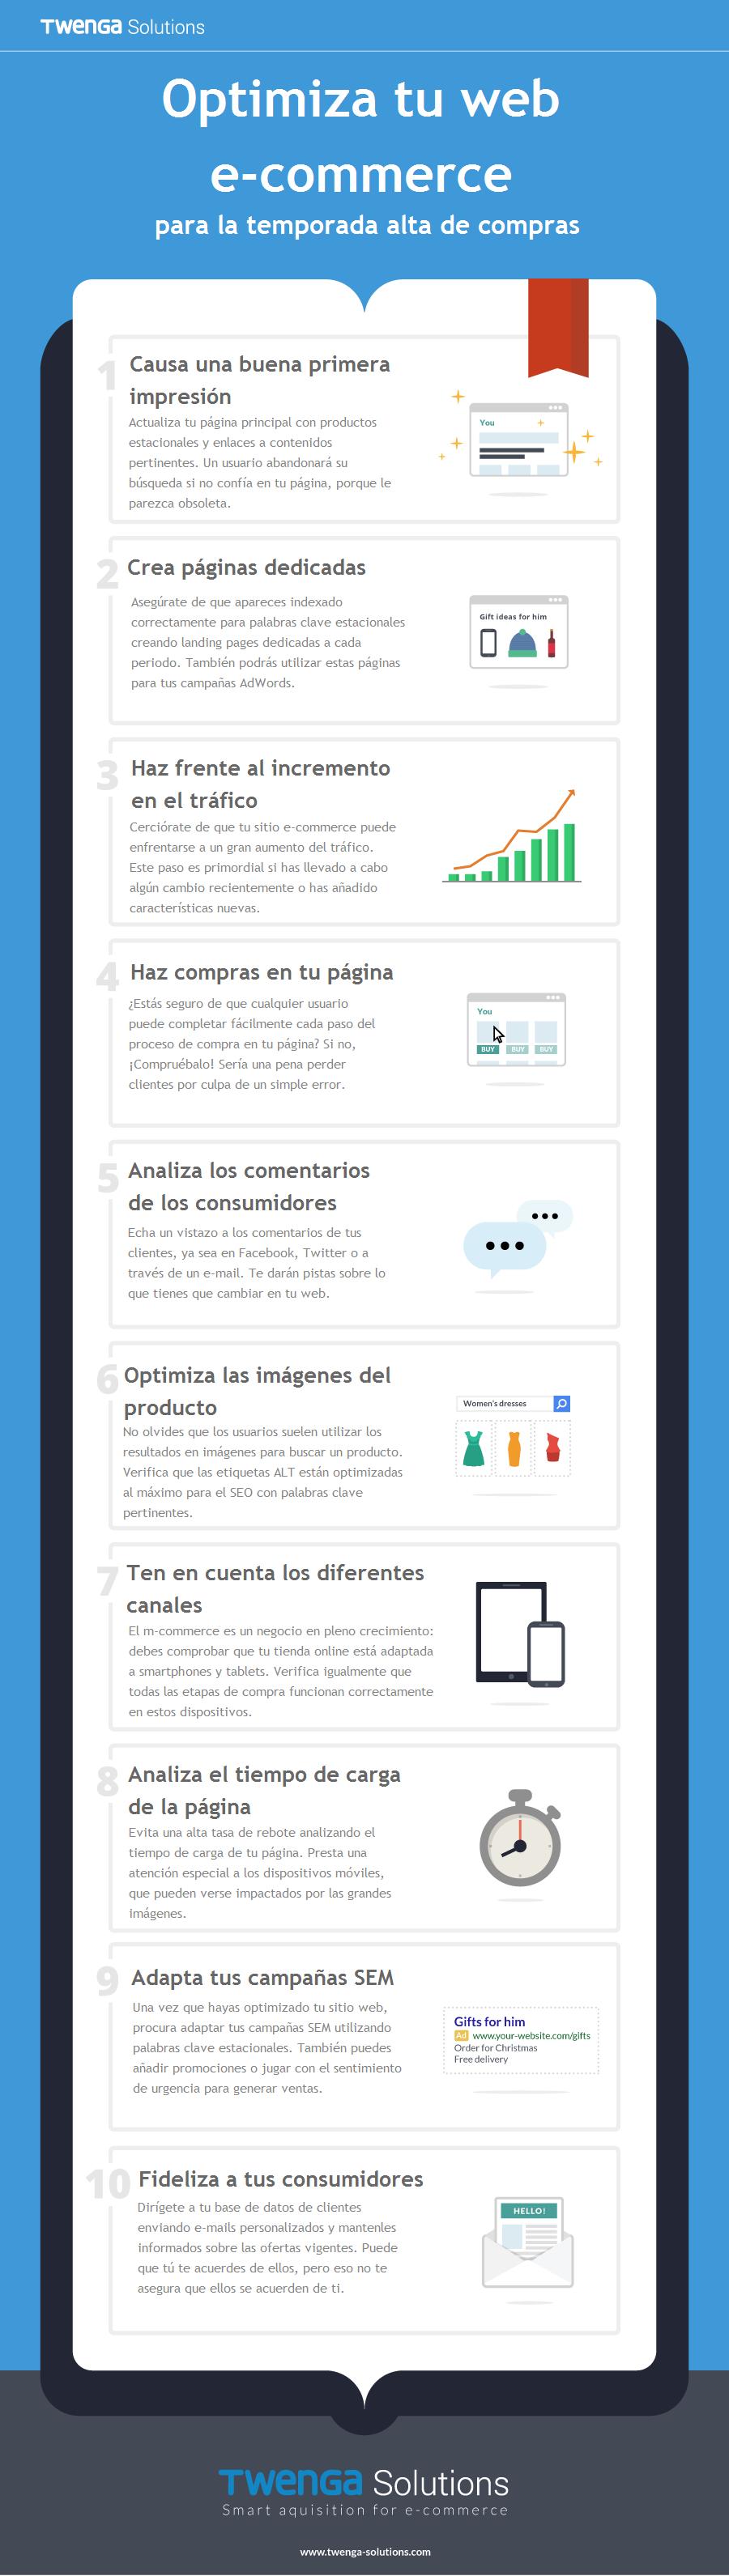 optimiza-web-ecommerce-infographic